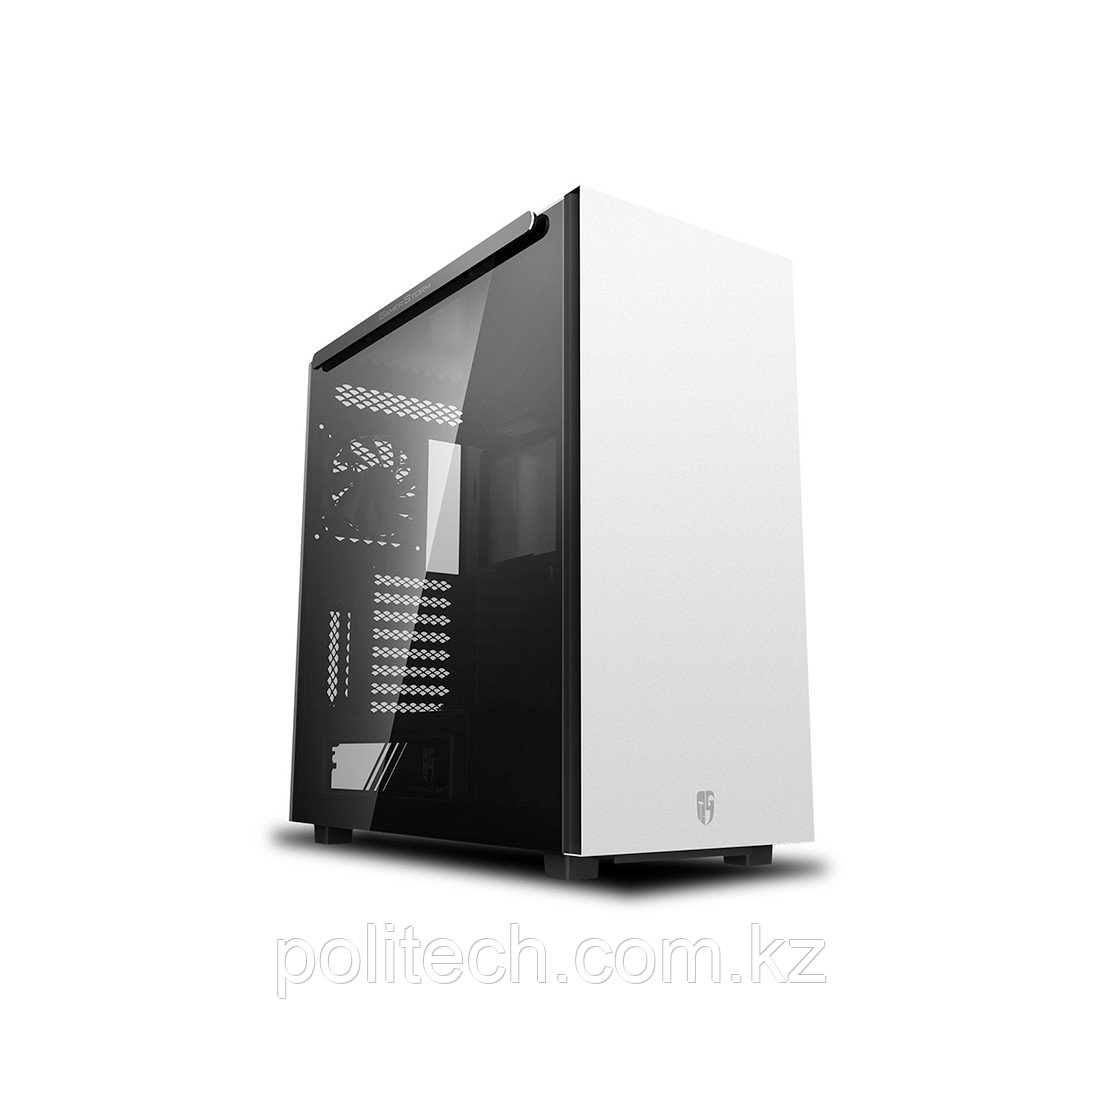 Компьютерный корпус Deepcool MACUBE 550 WH без Б/П